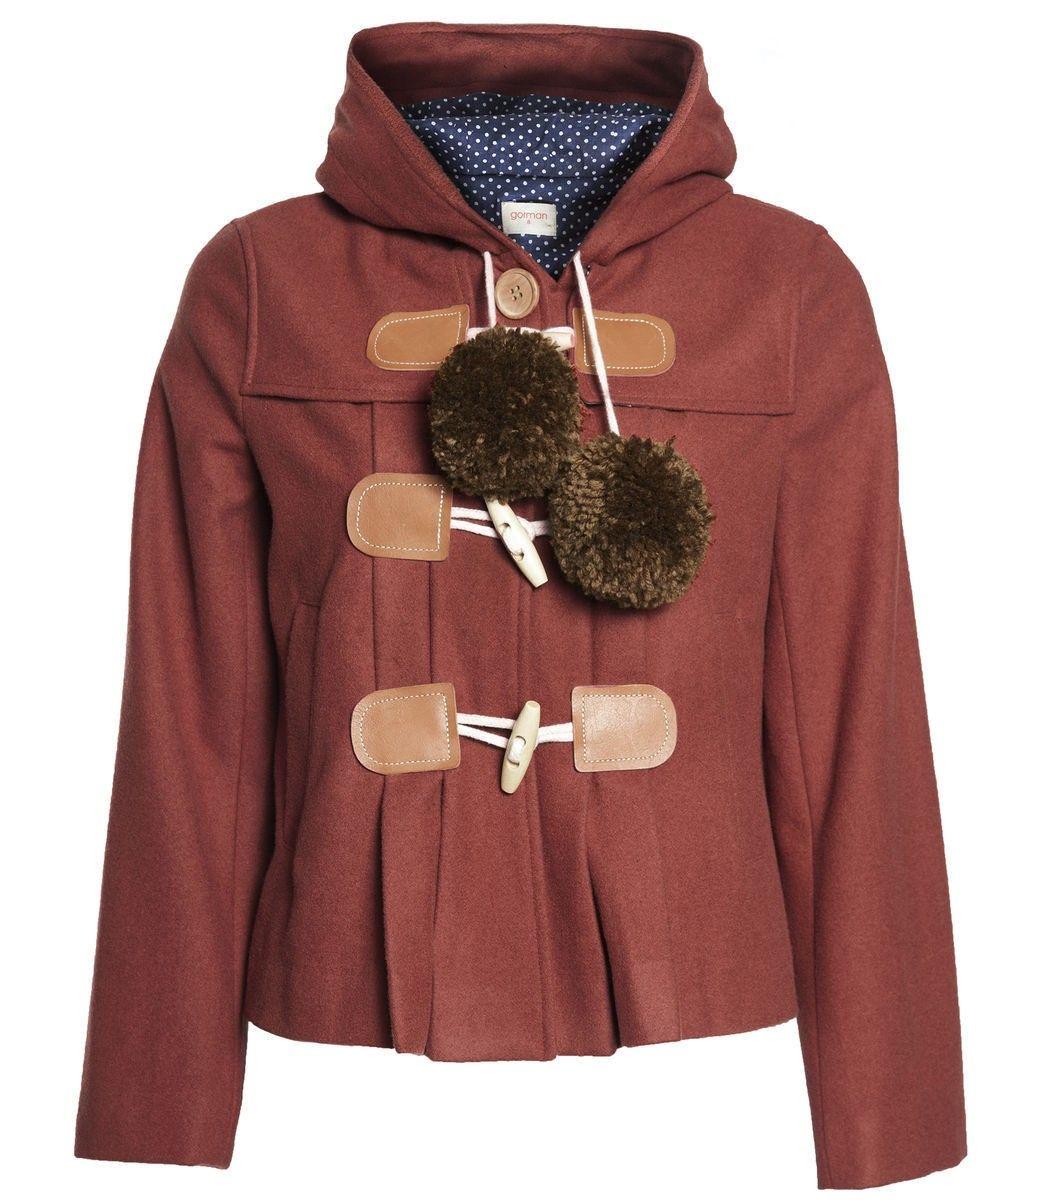 Pom pom duffle jacket gorman | Fashion | Pinterest | Charlotte ...